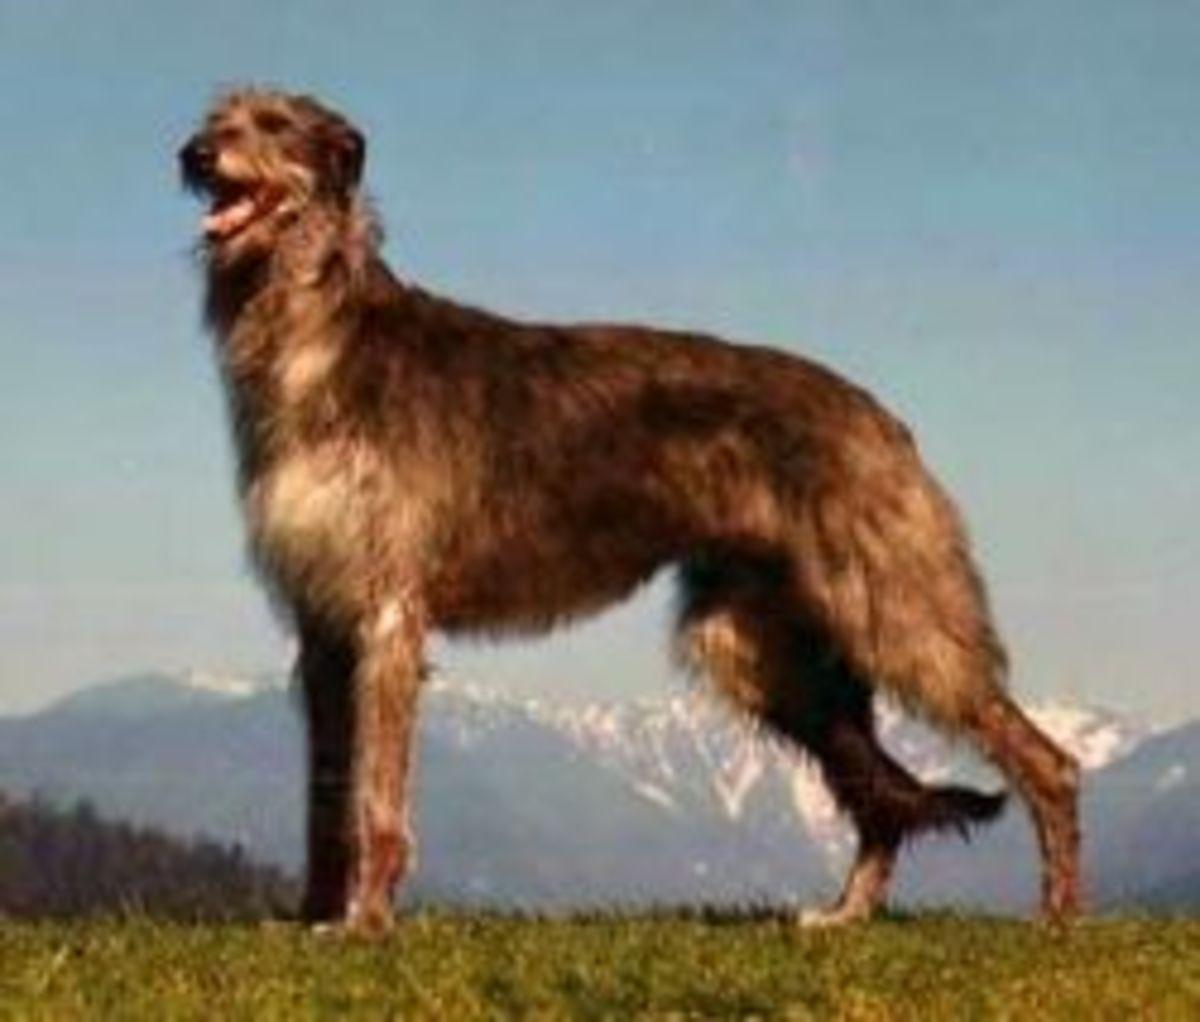 The Scottish Deerhound resembles the Cwn Anwyn